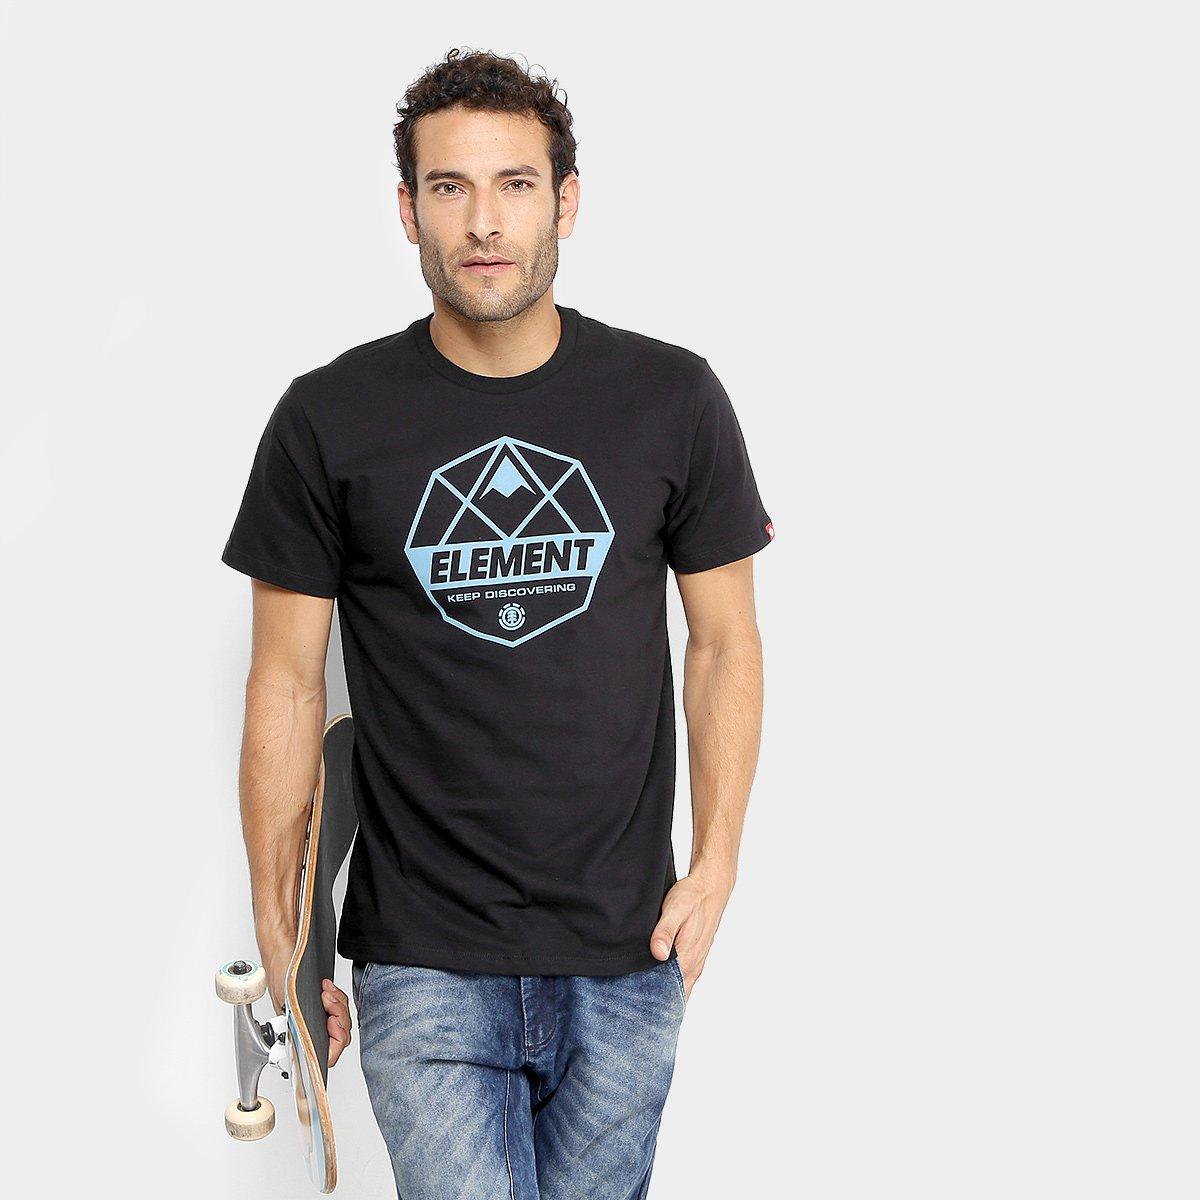 Camiseta Element Dome Masculina - Compre Agora  c8787d9954e